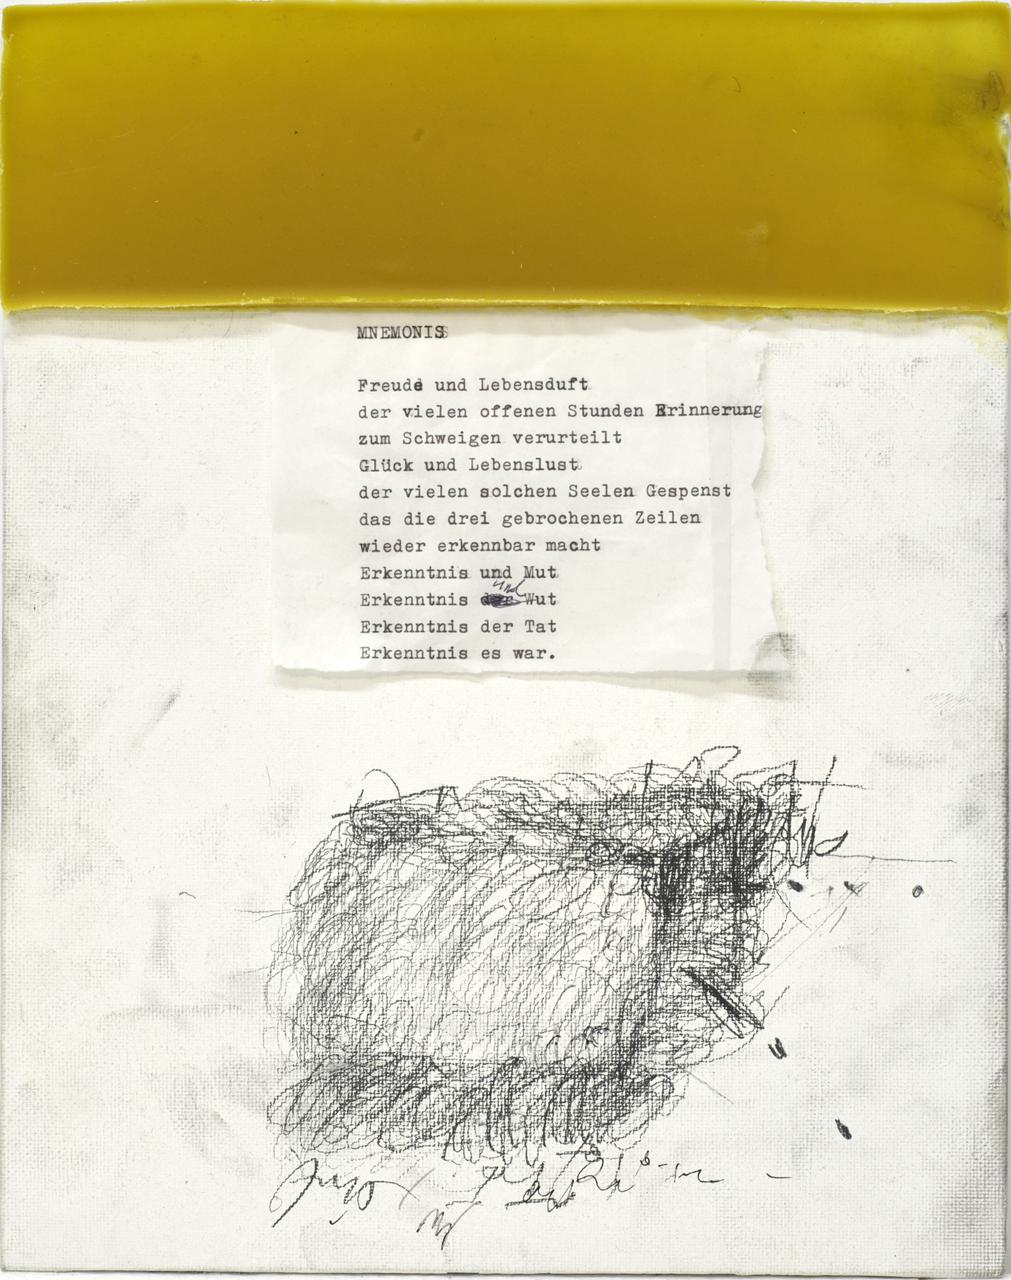 Atem Speicher 2, 2016, bees wax, graphite, paper collage, type writer, on canvas board, 29x23 εκ